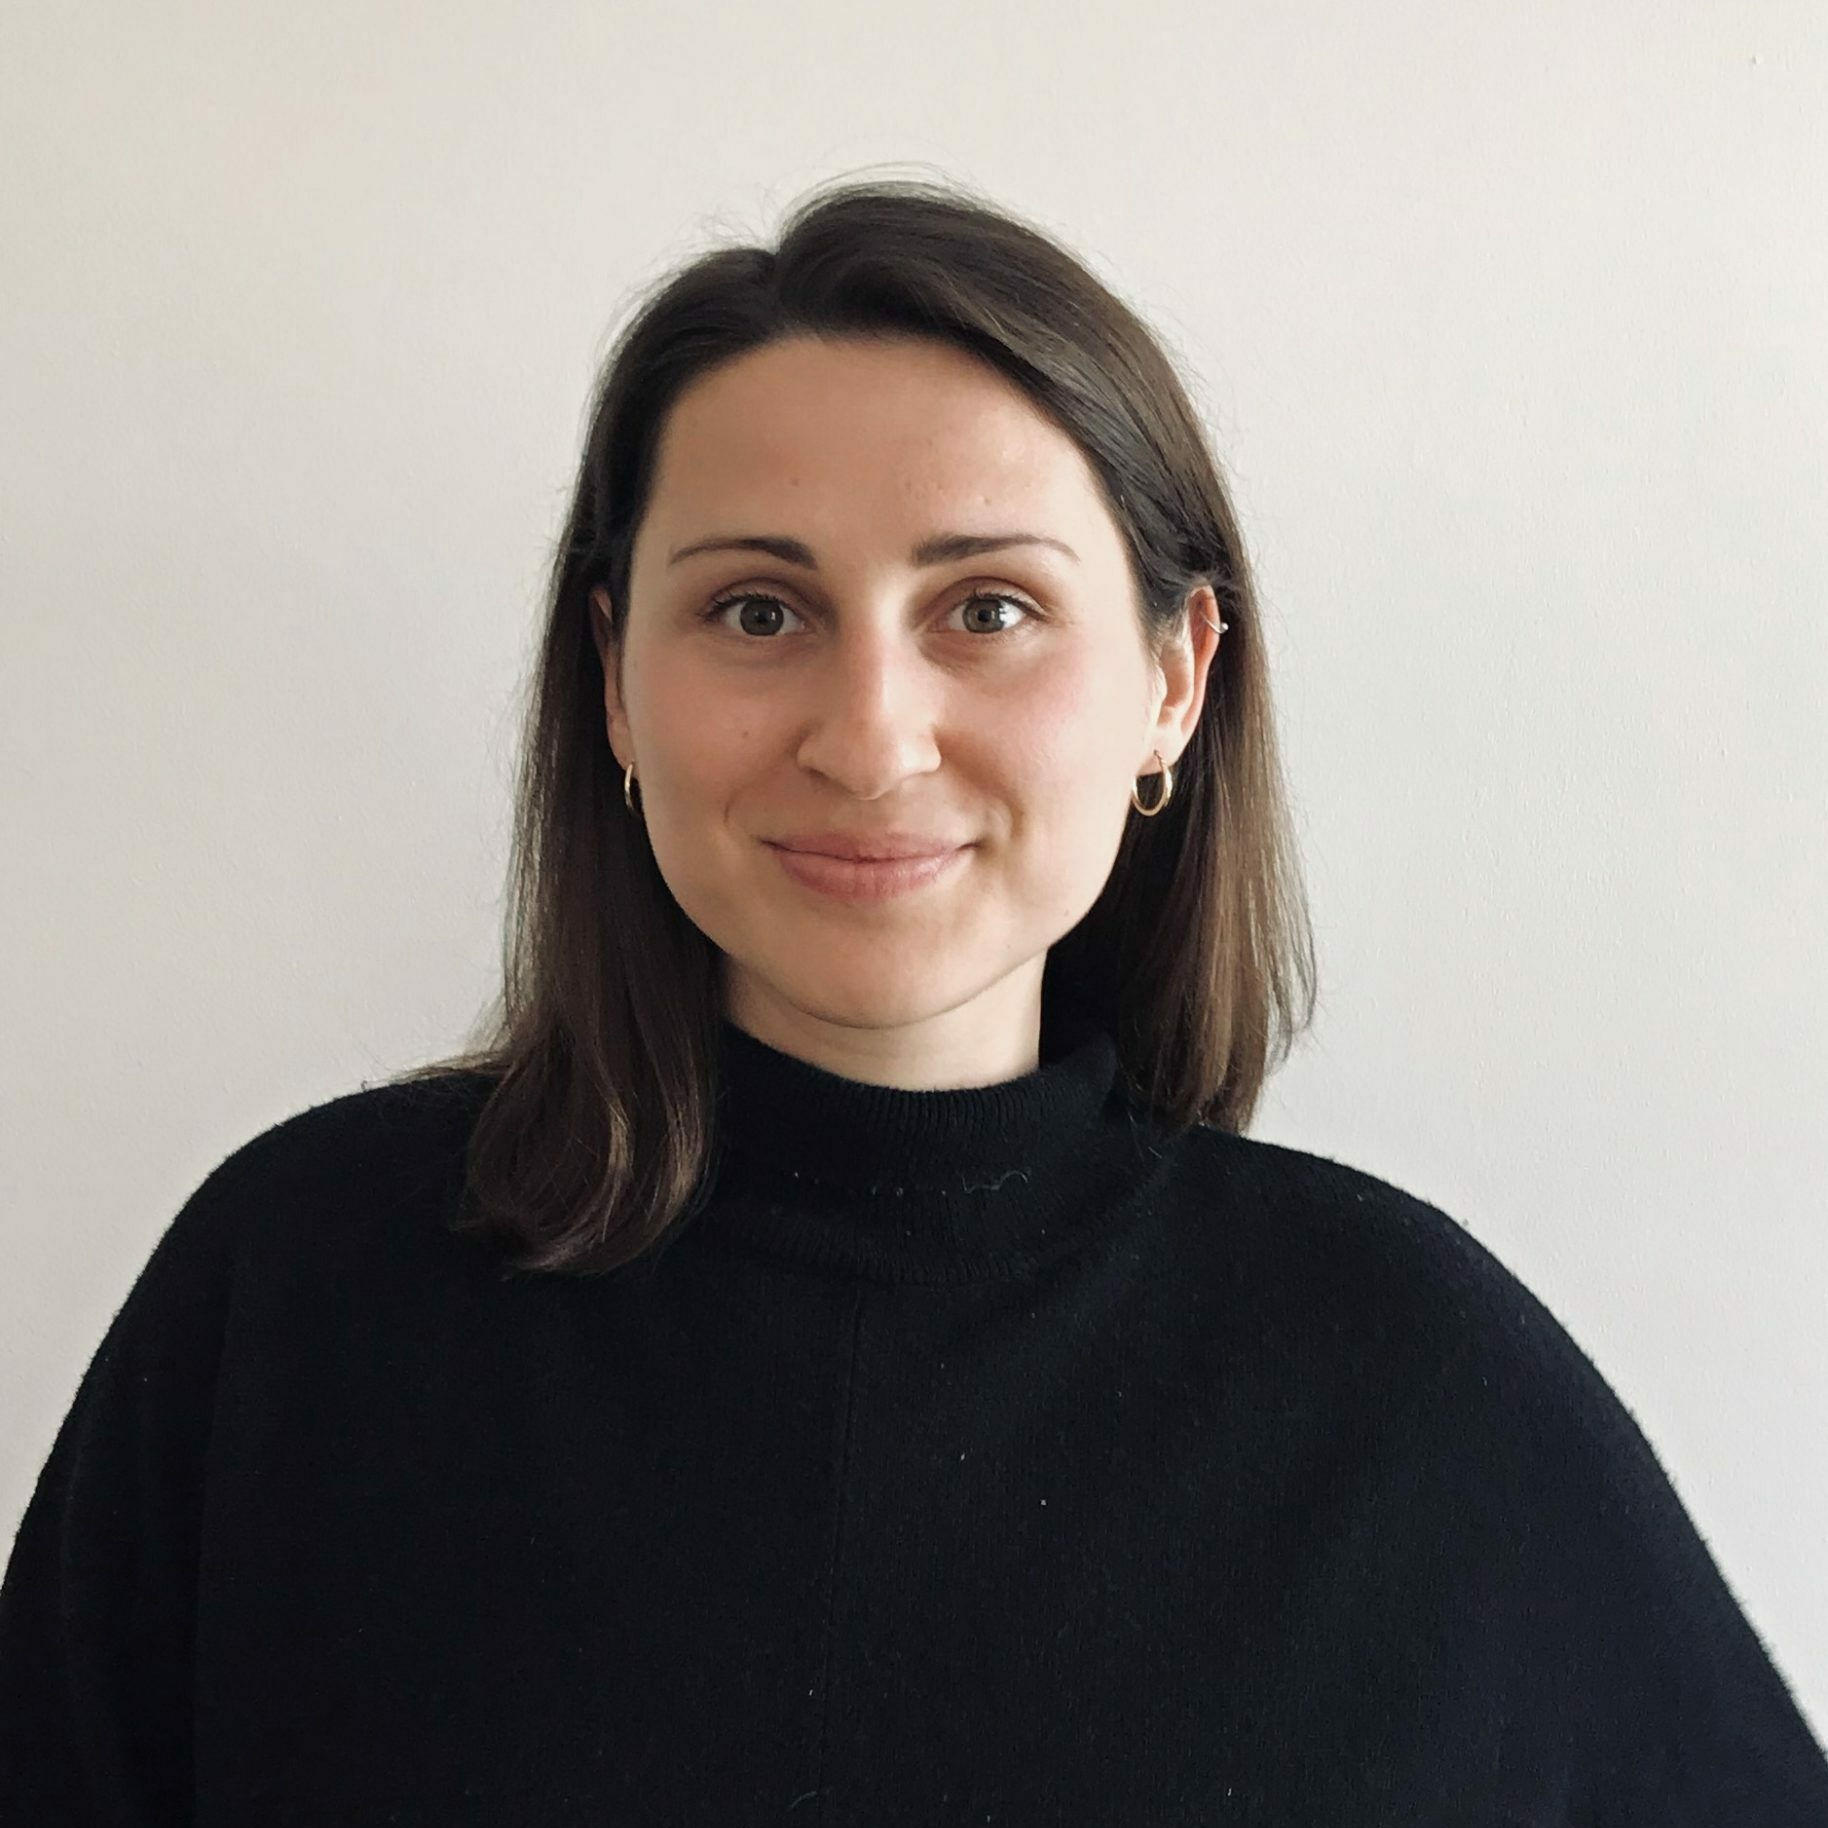 Victoria Hugelshofer